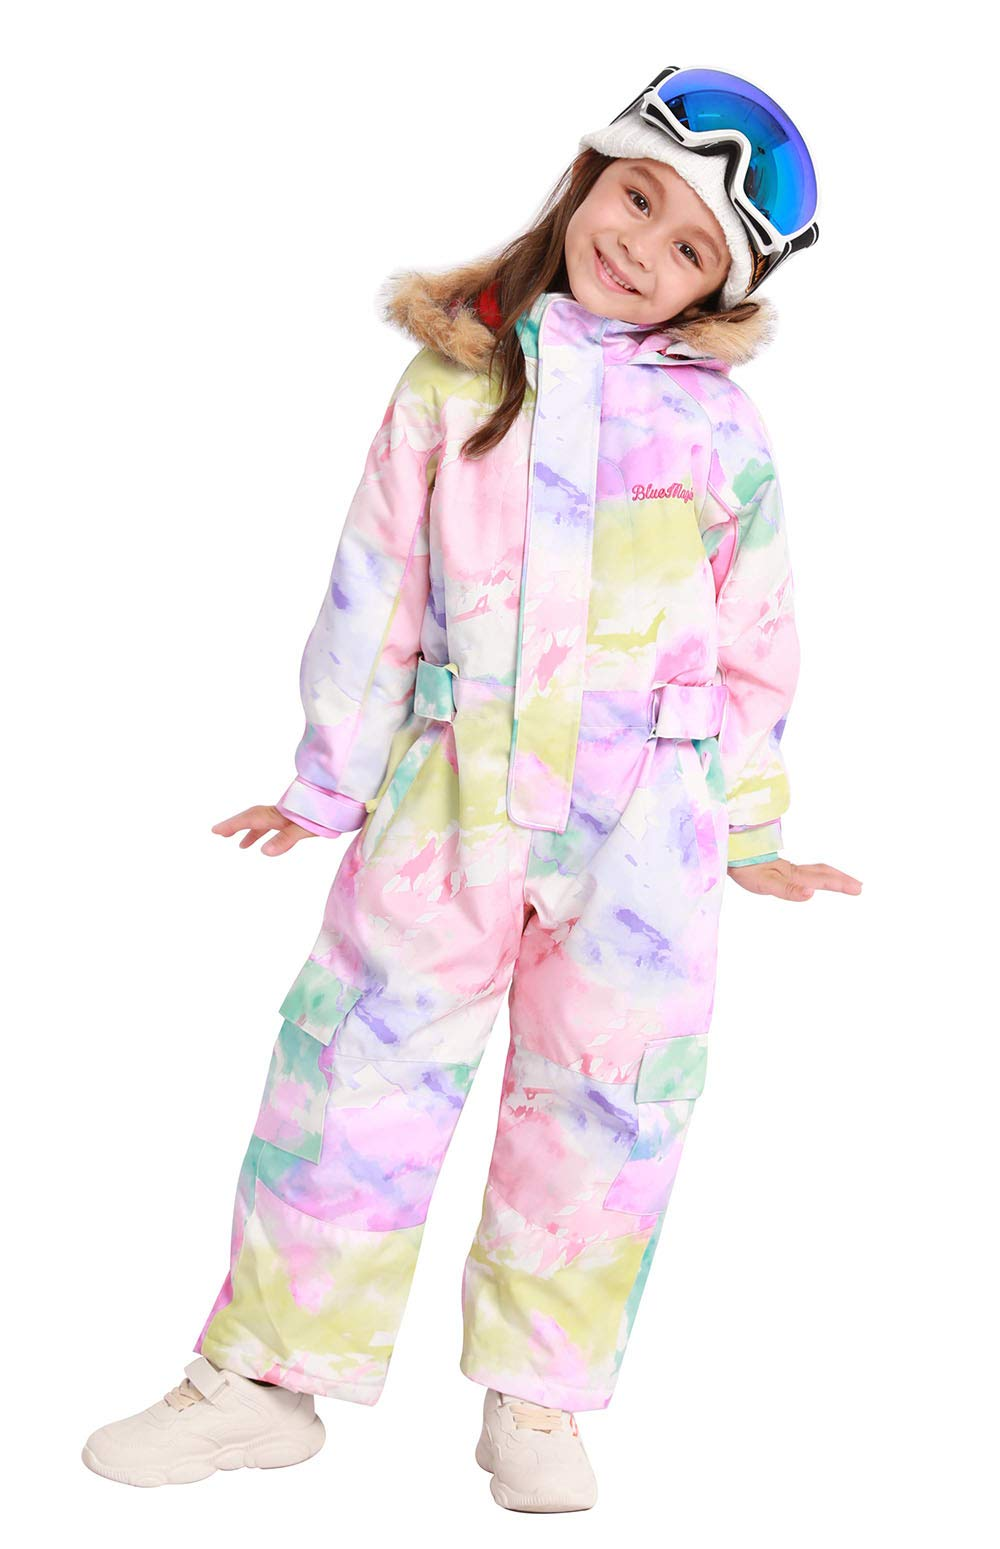 Bluemagic Little Kid's One Piece Overall Snowsuits Ski Suits Jackets Coats Jumpsuits,Water Color,120cm by Bluemagic